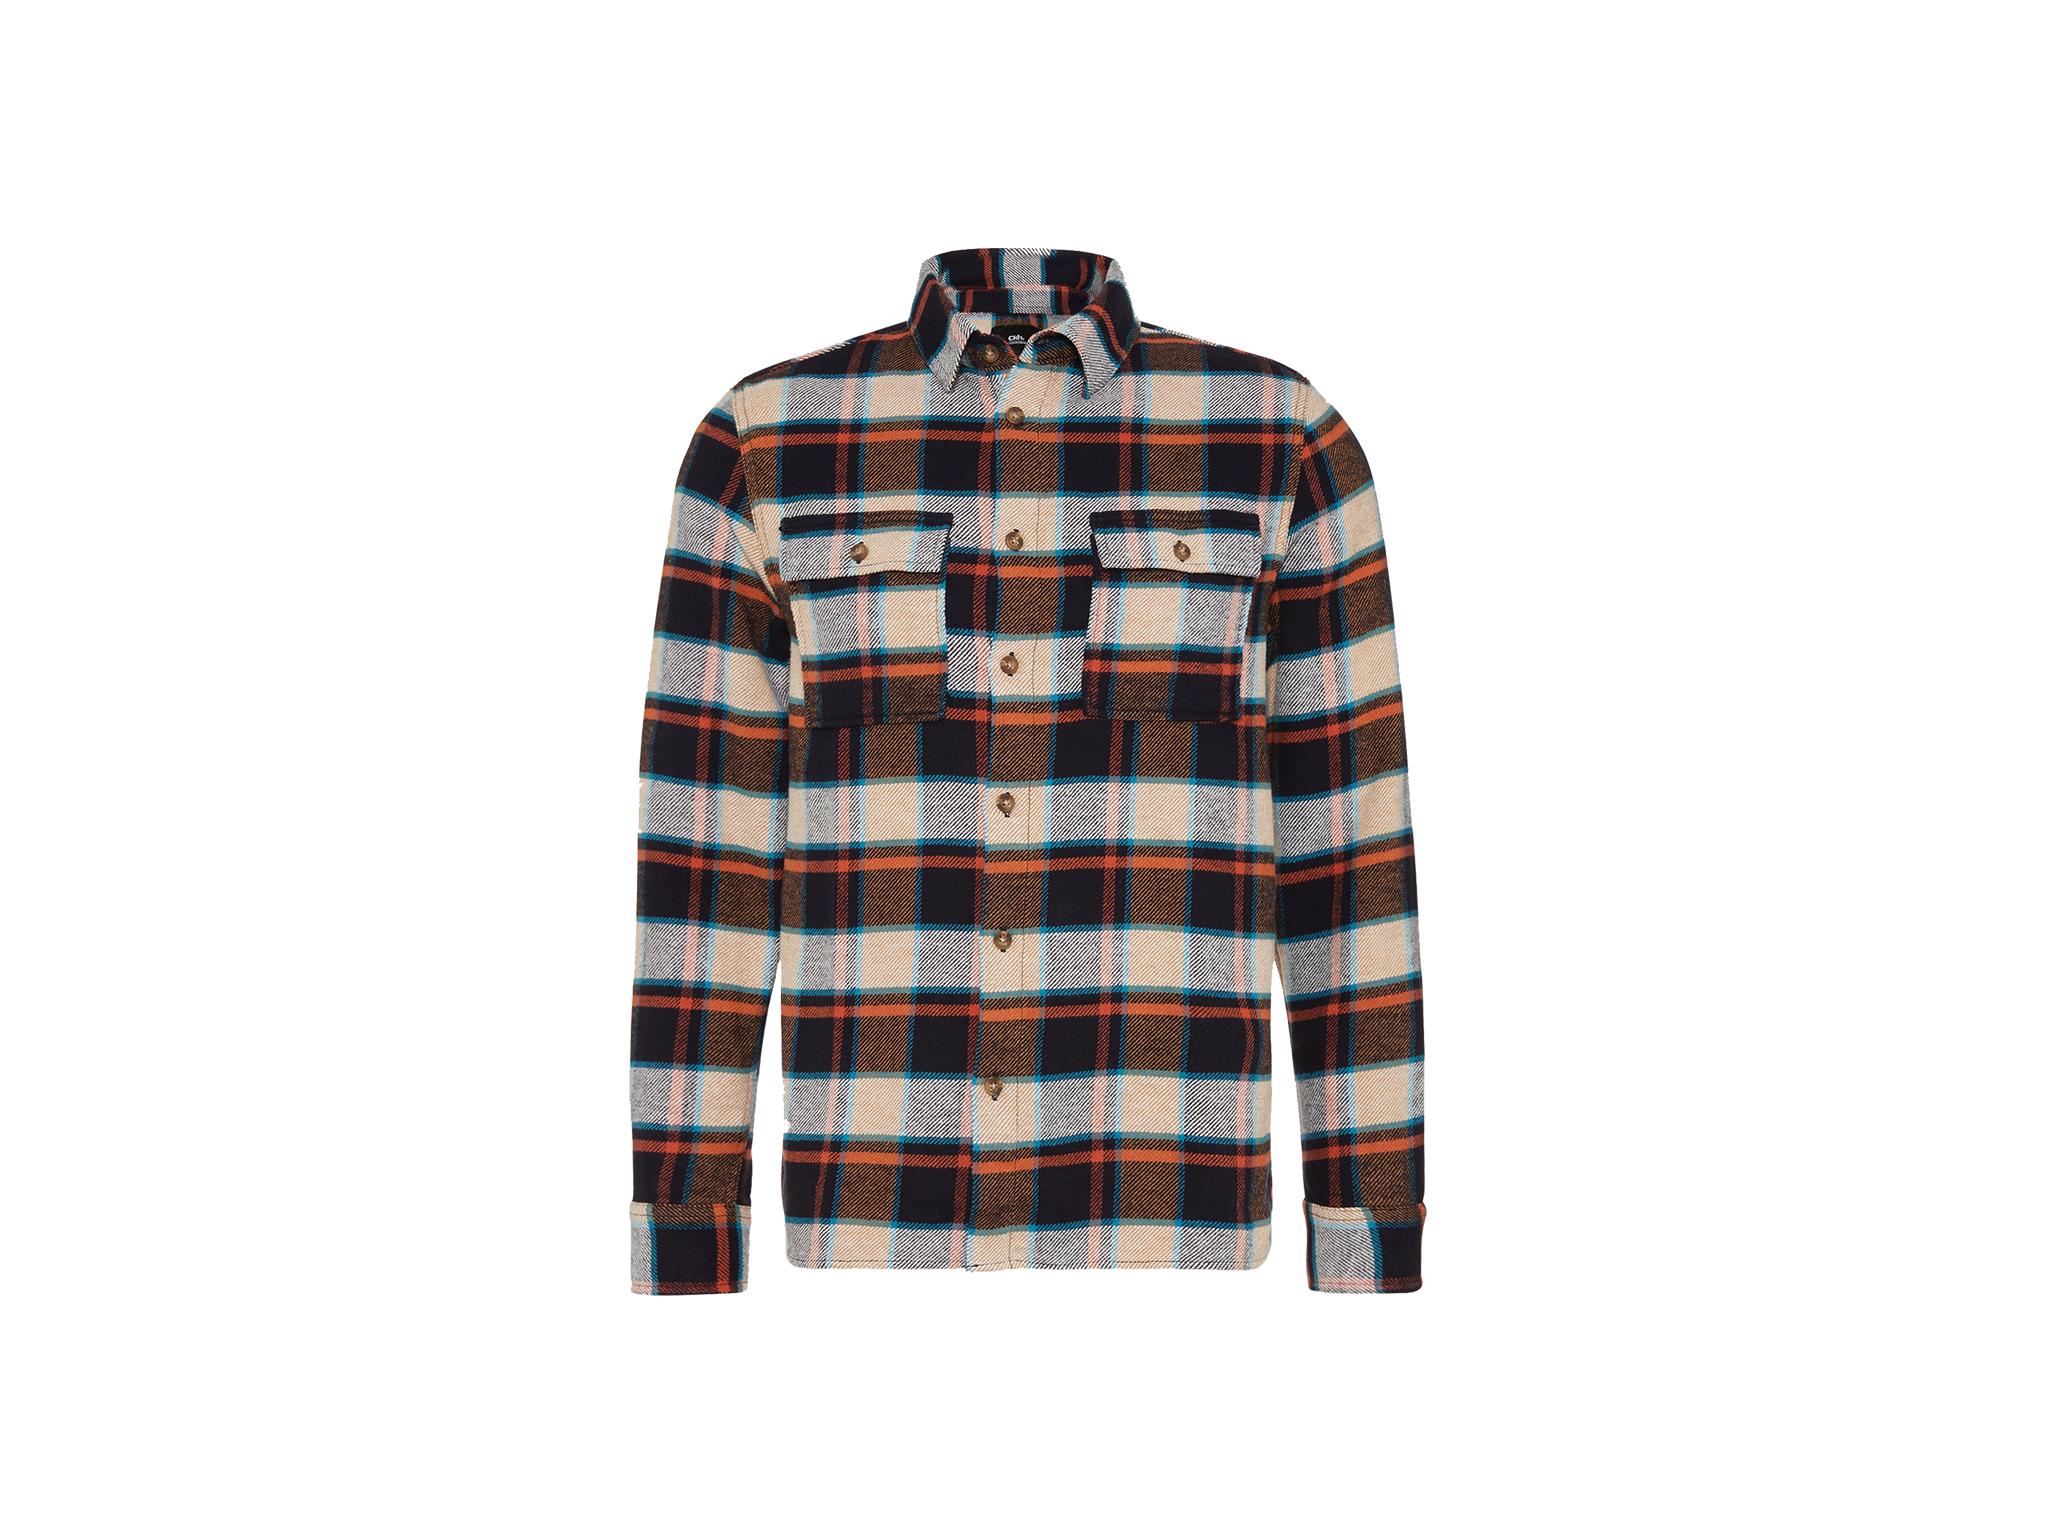 Compras, Shopping Natal, C&A, Camisa